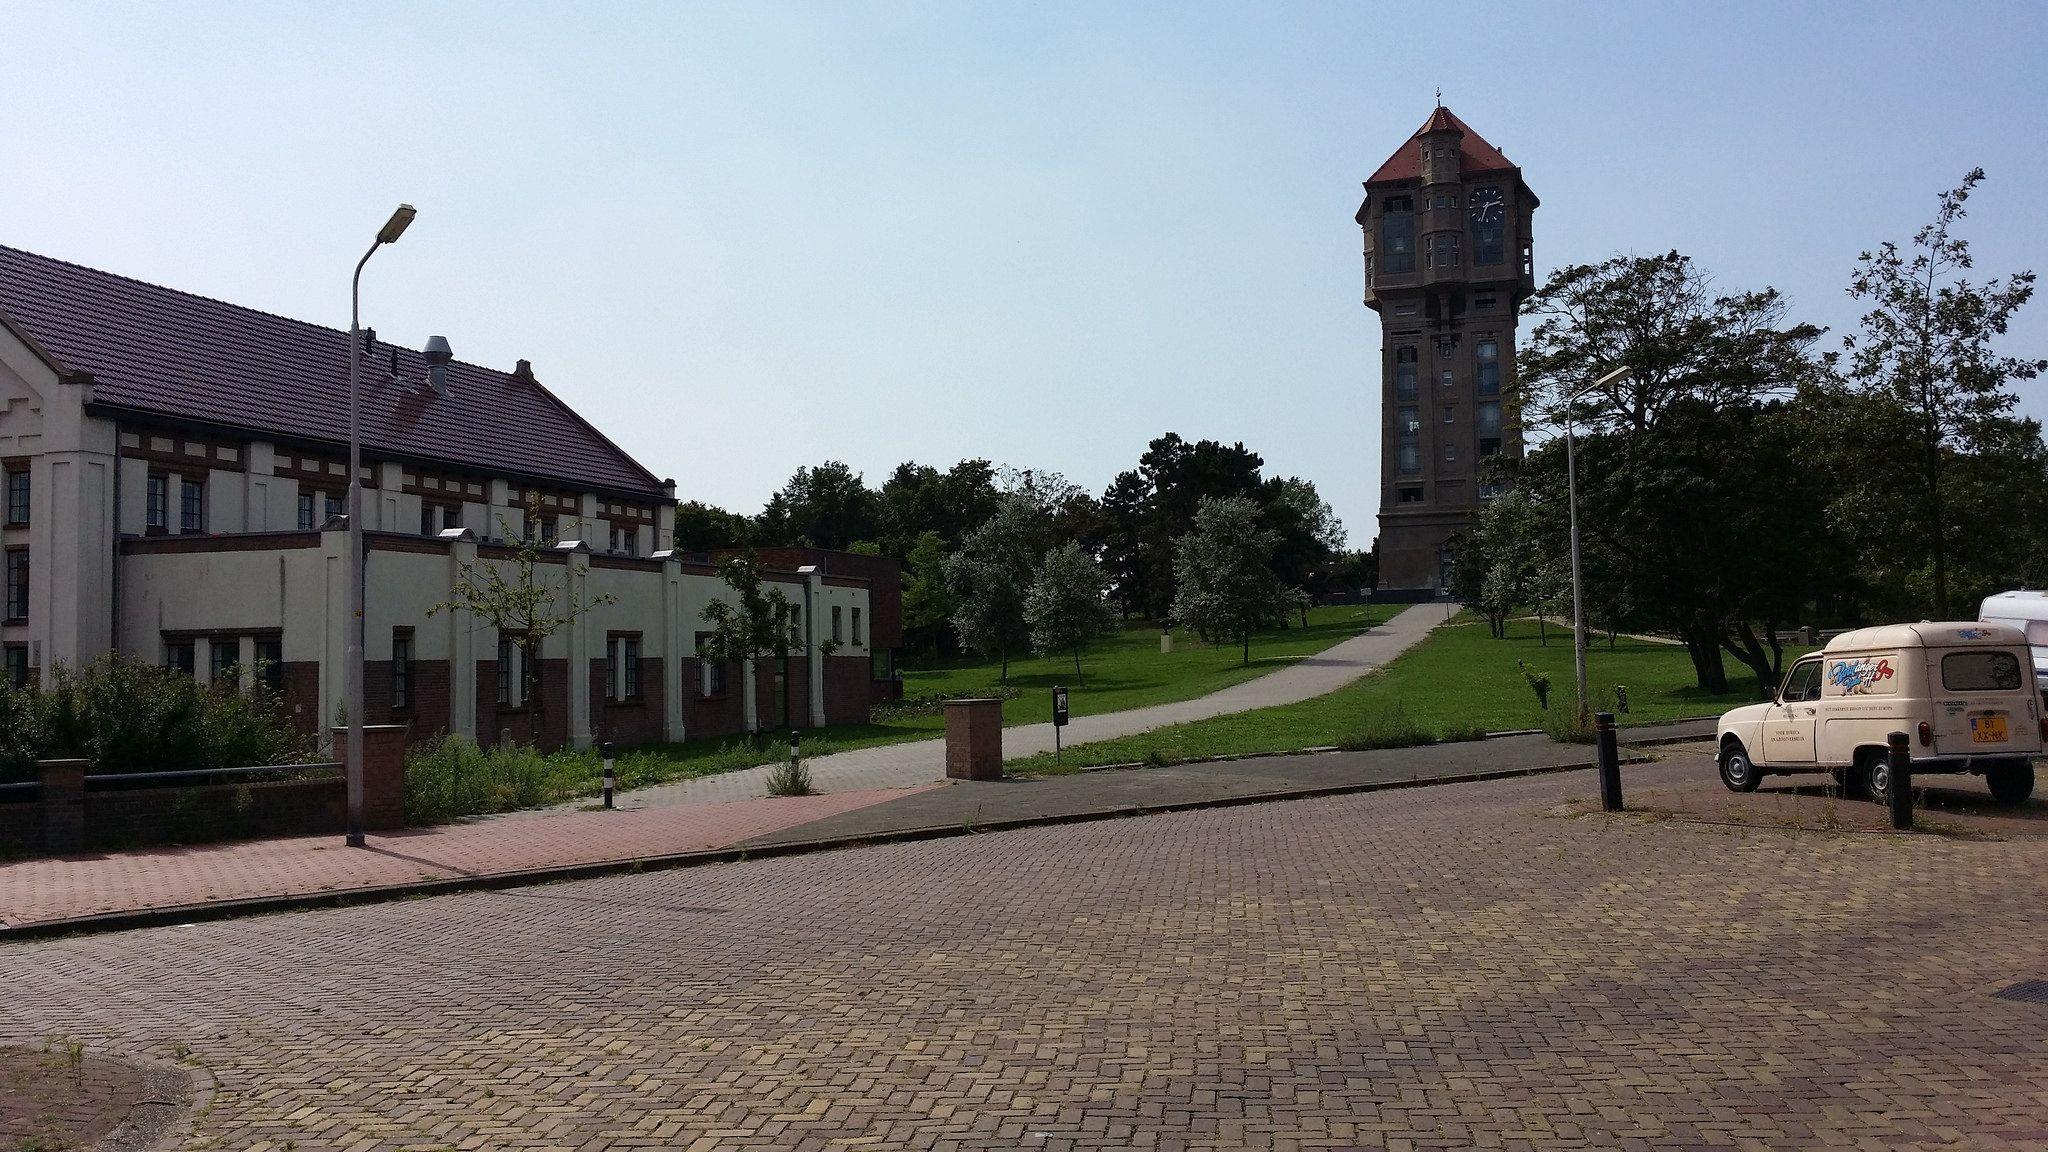 https://flic.kr/p/wHLhsQ | Watertoren IJmuiden